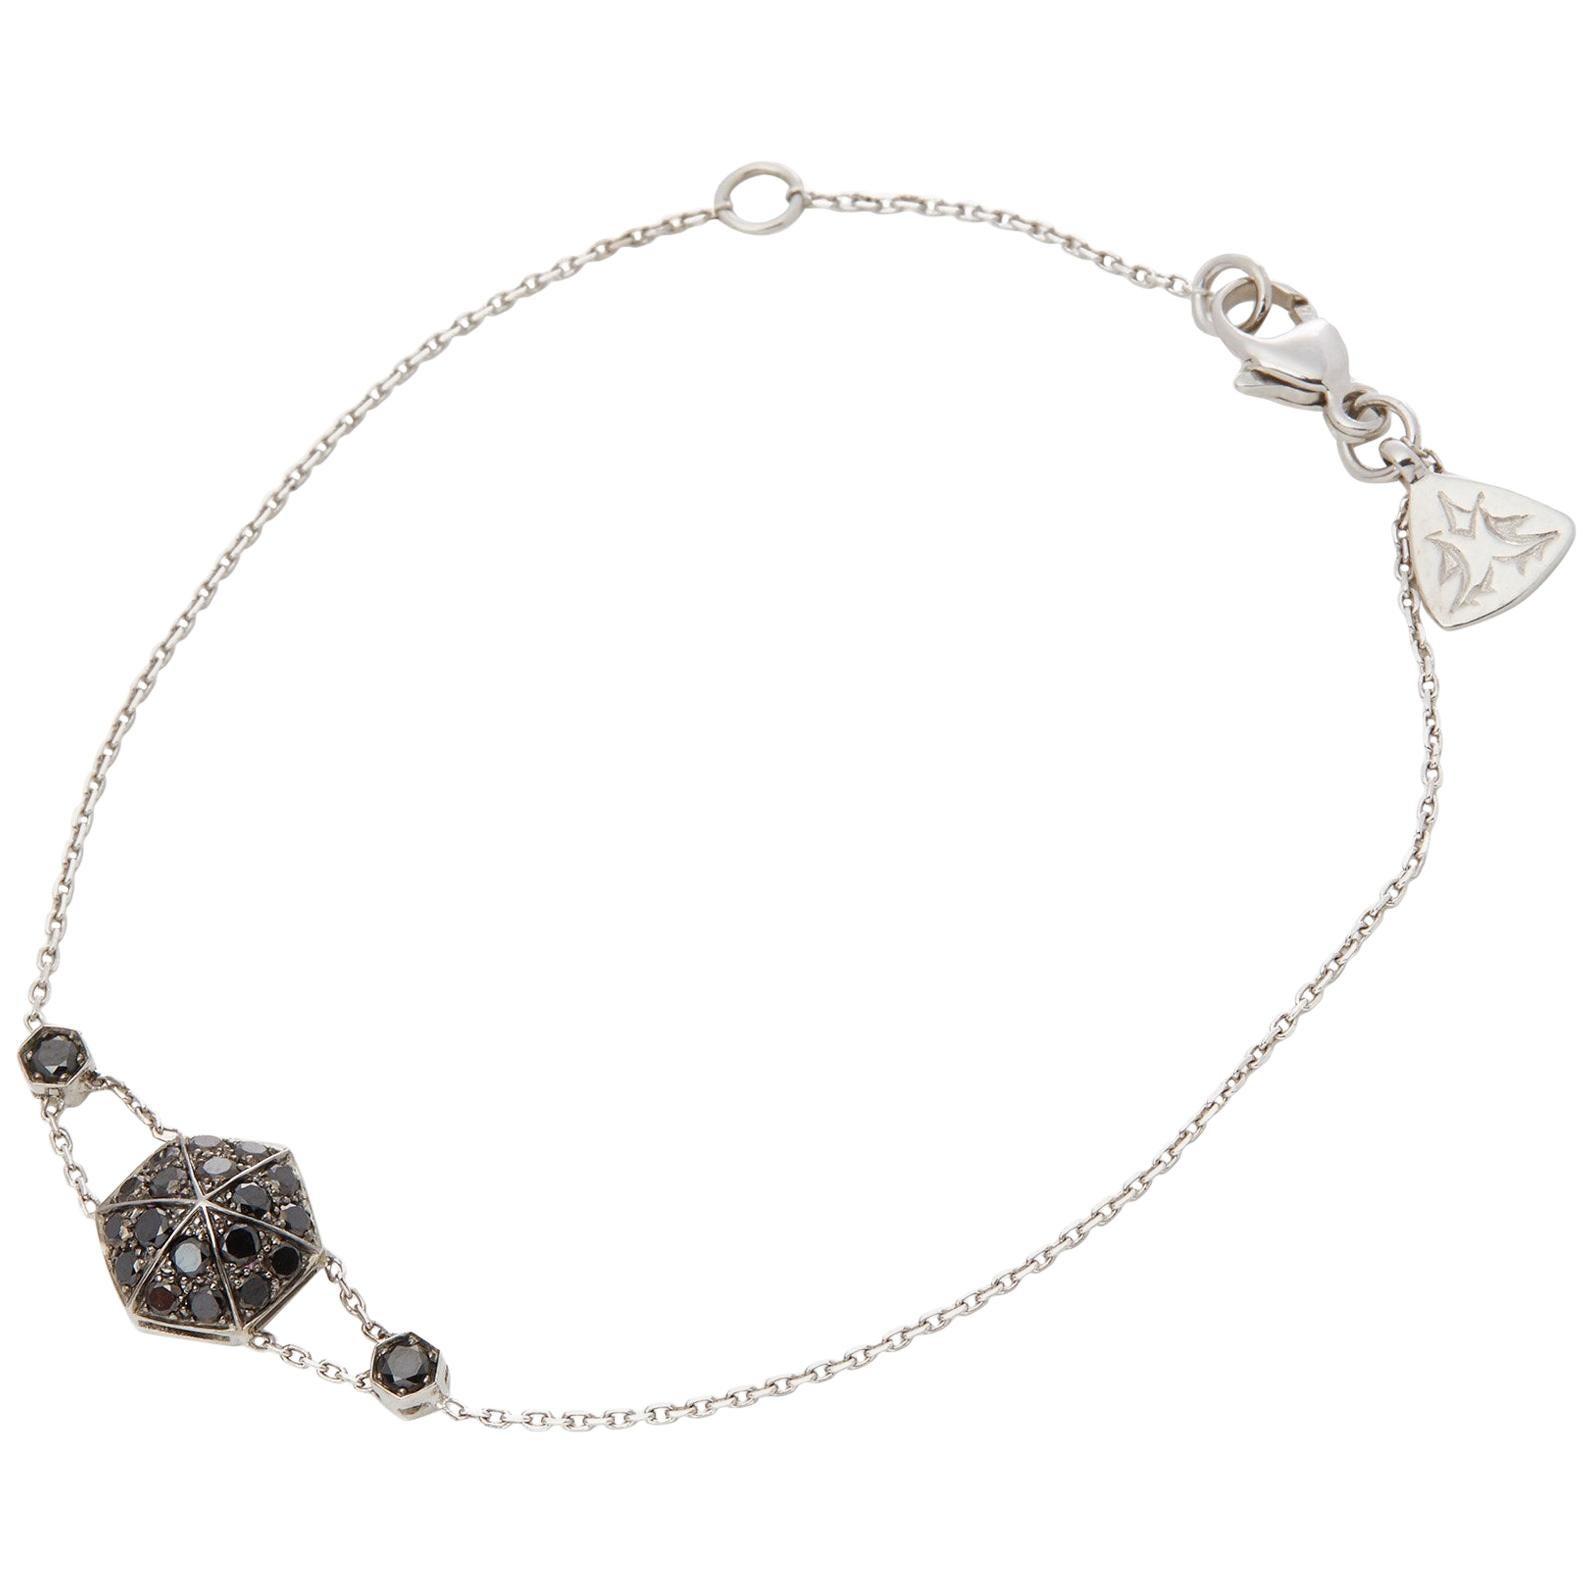 Stephen Webster 18 Karat White Gold Black Diamond Pave Deco Bracelet